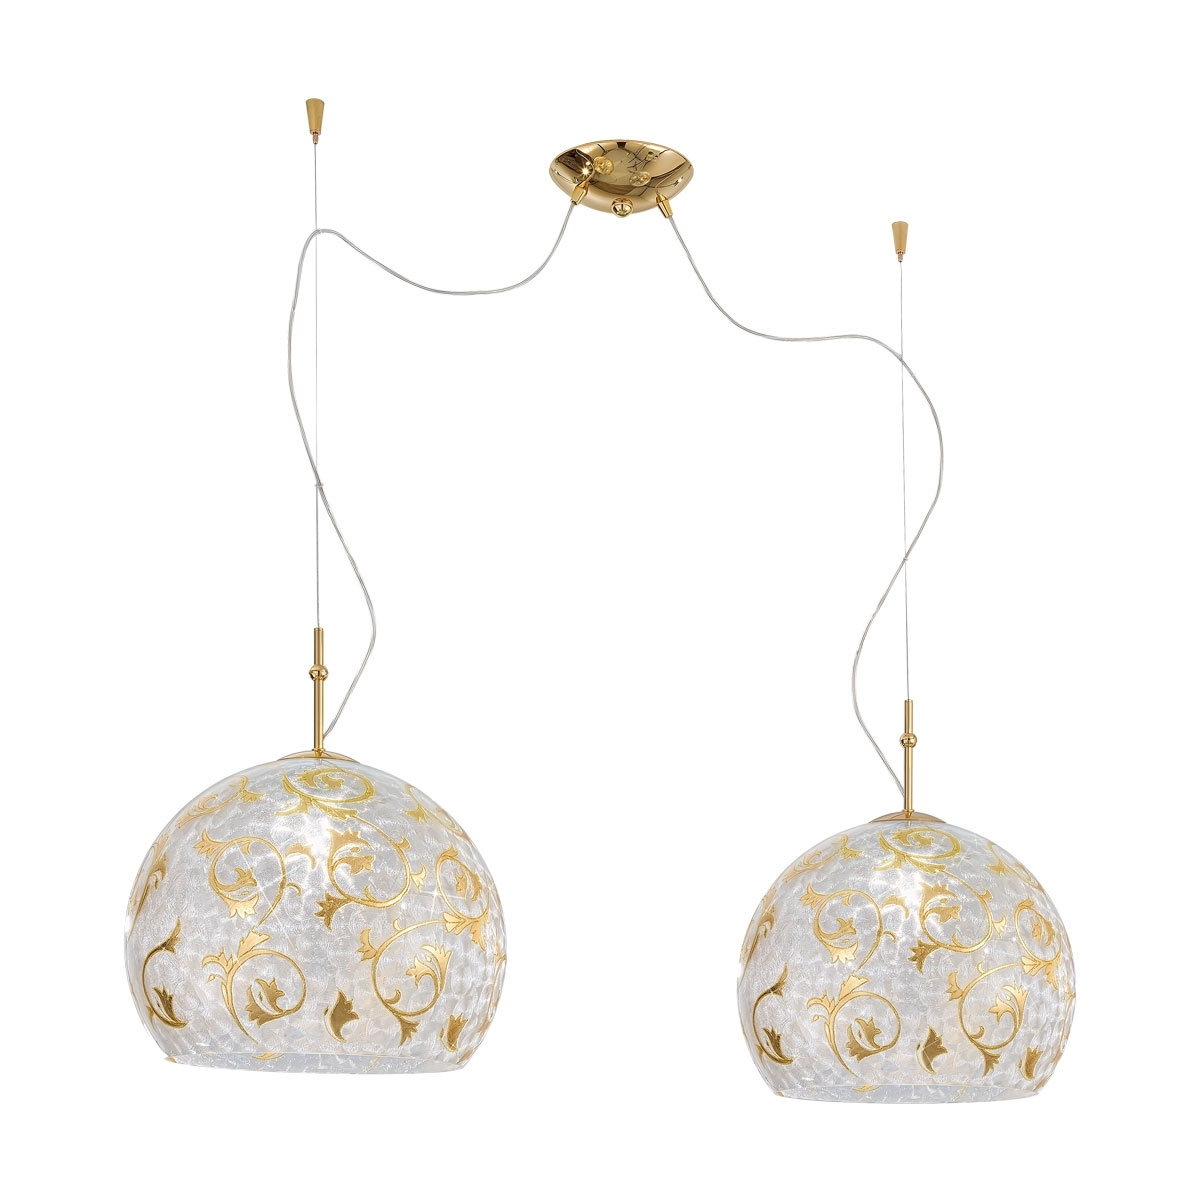 kolarz-pendelleuchte-luna-pl-gold-transparent-glas-metall-0392-32-3-tc-au